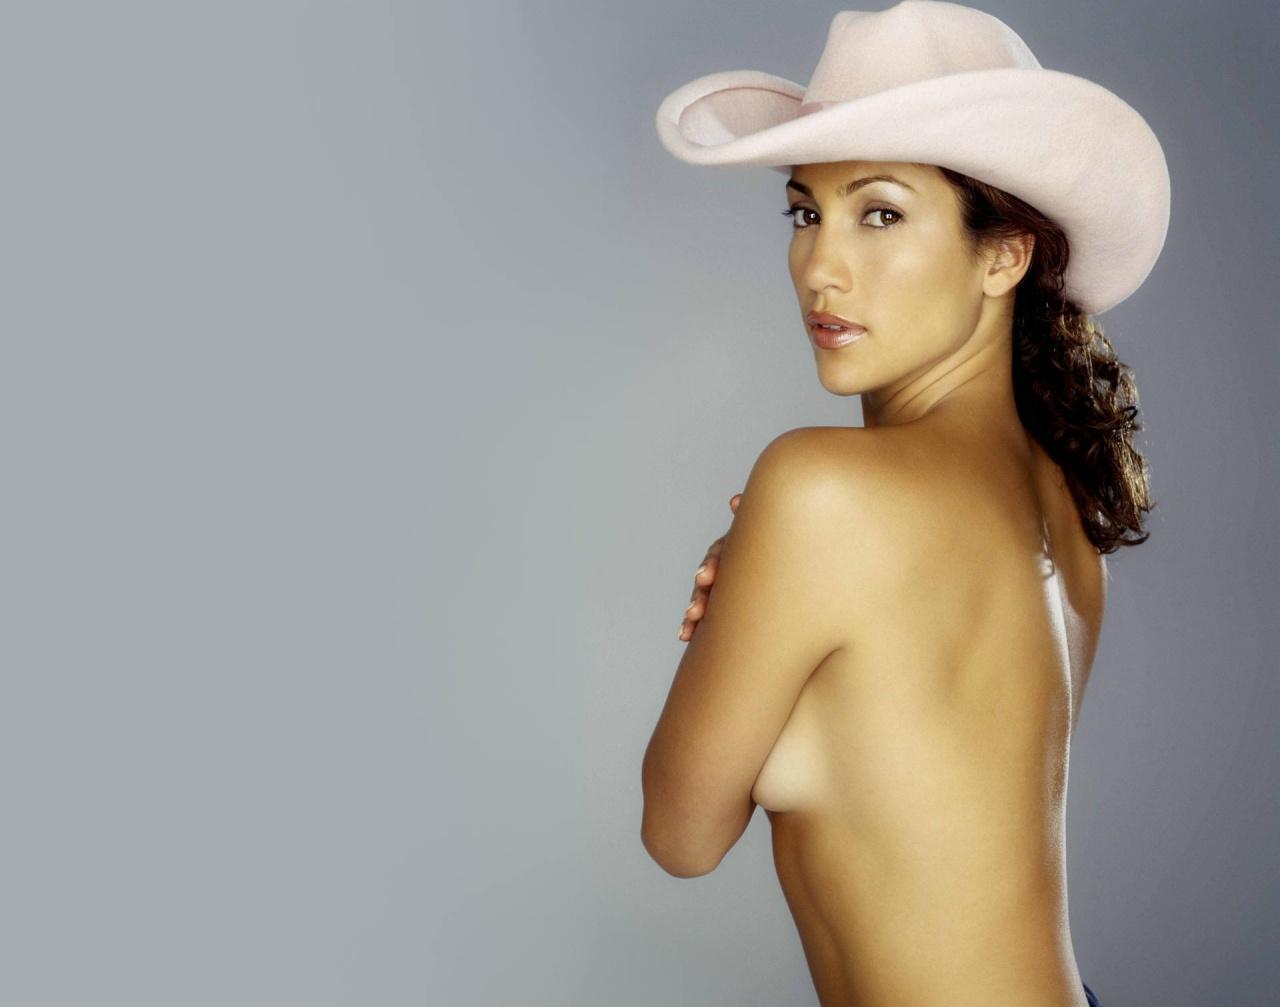 http://2.bp.blogspot.com/-6szxV1YYirQ/UQyQYNSkEXI/AAAAAAAABmA/dZV4ECy2EqQ/s1600/Jennifer+Lopez+Wallpaper-2.jpg